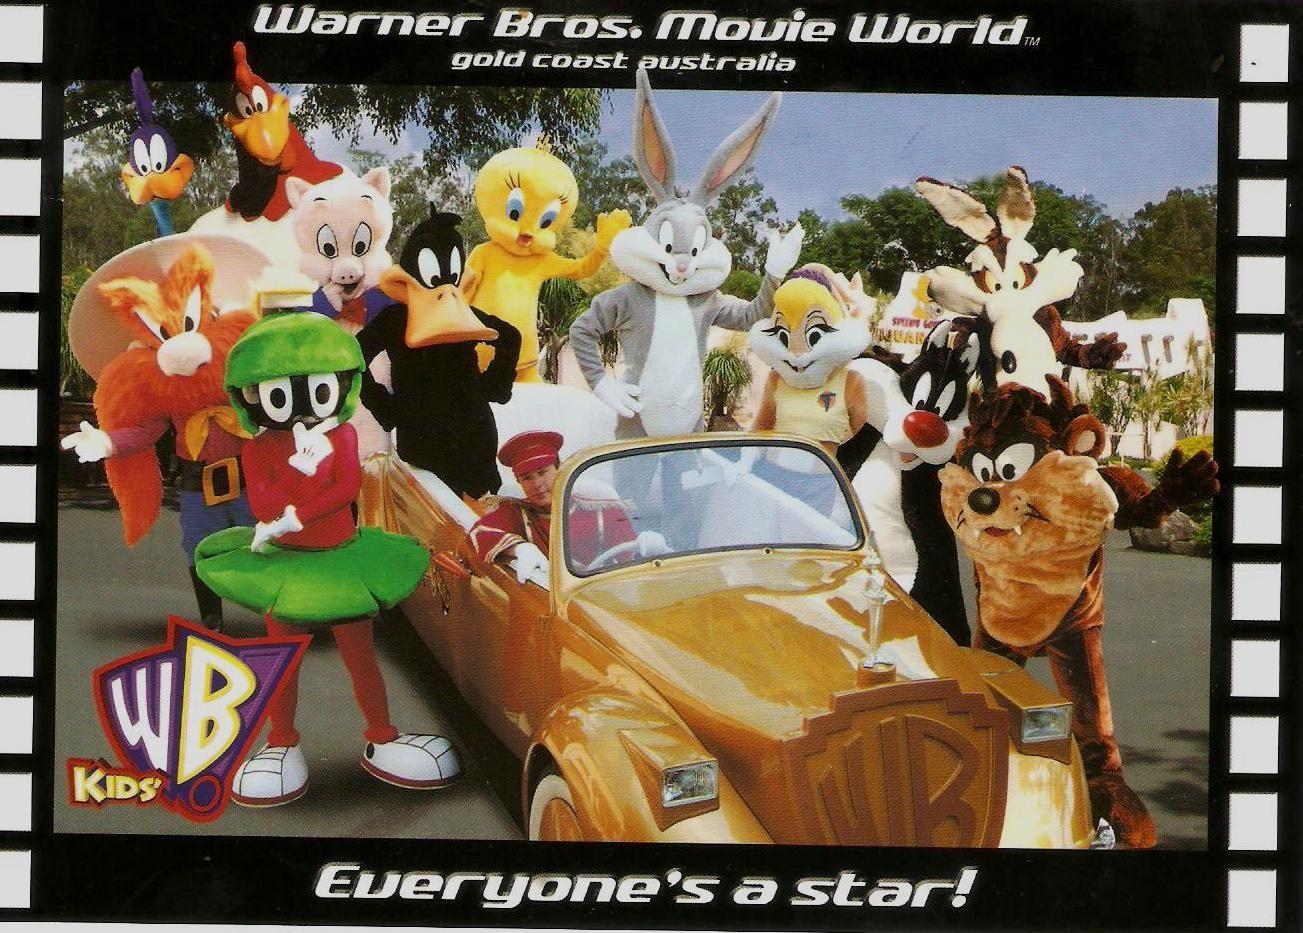 WB Kids at Warner Brothers Movie World theme park Theme